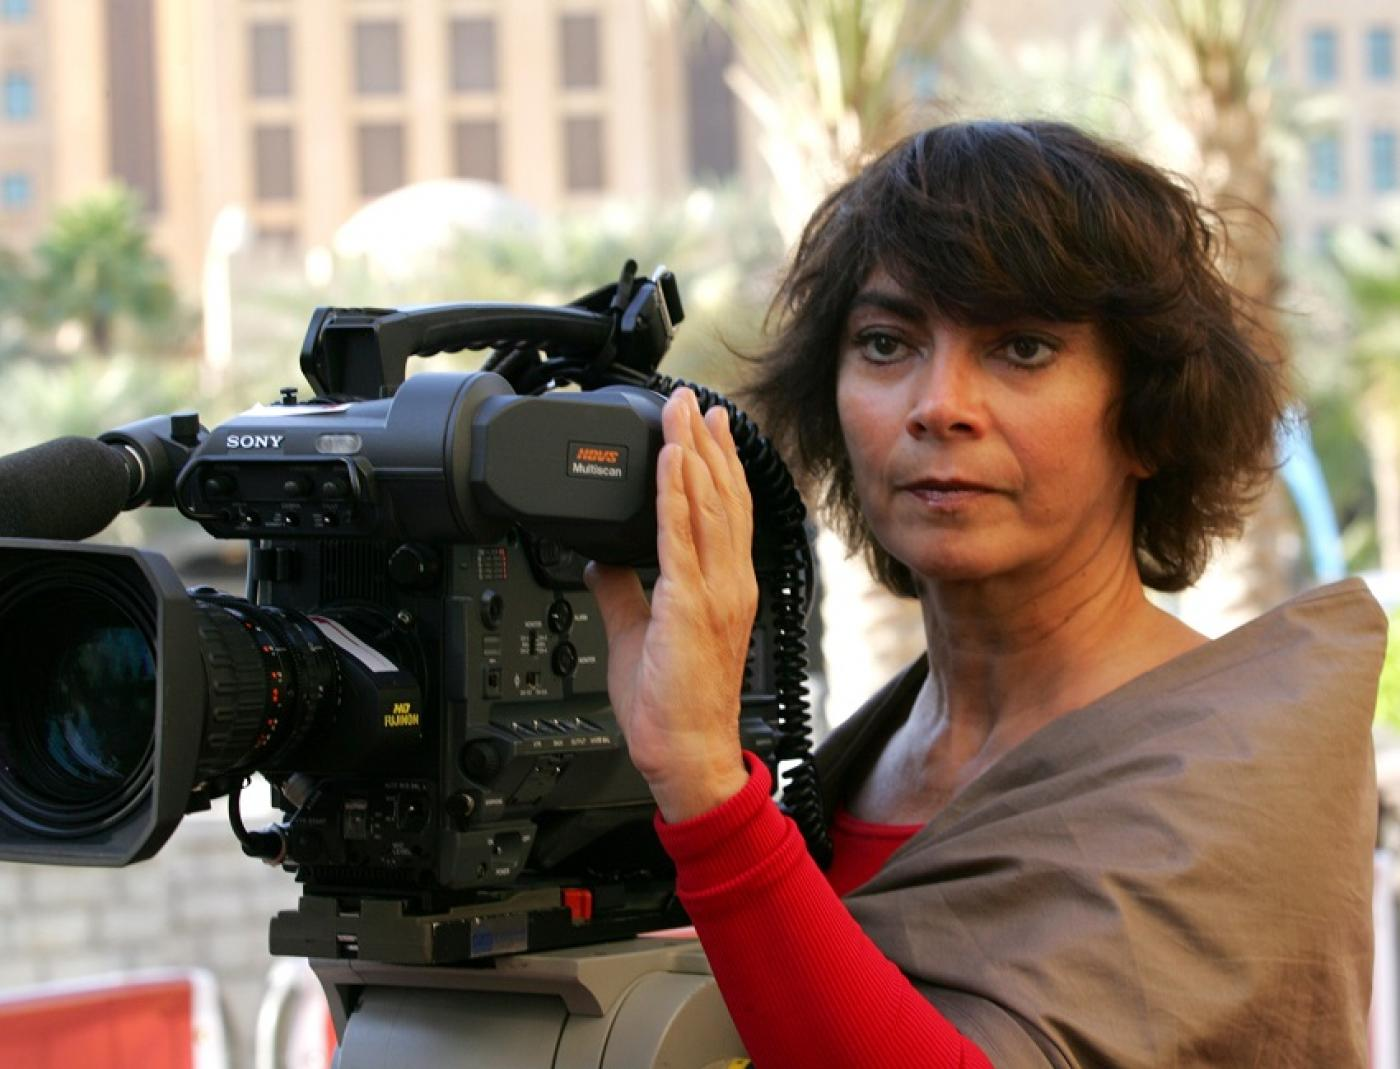 Amr Fawzi a tale of two film mavericks: jocelyne saab and oussama